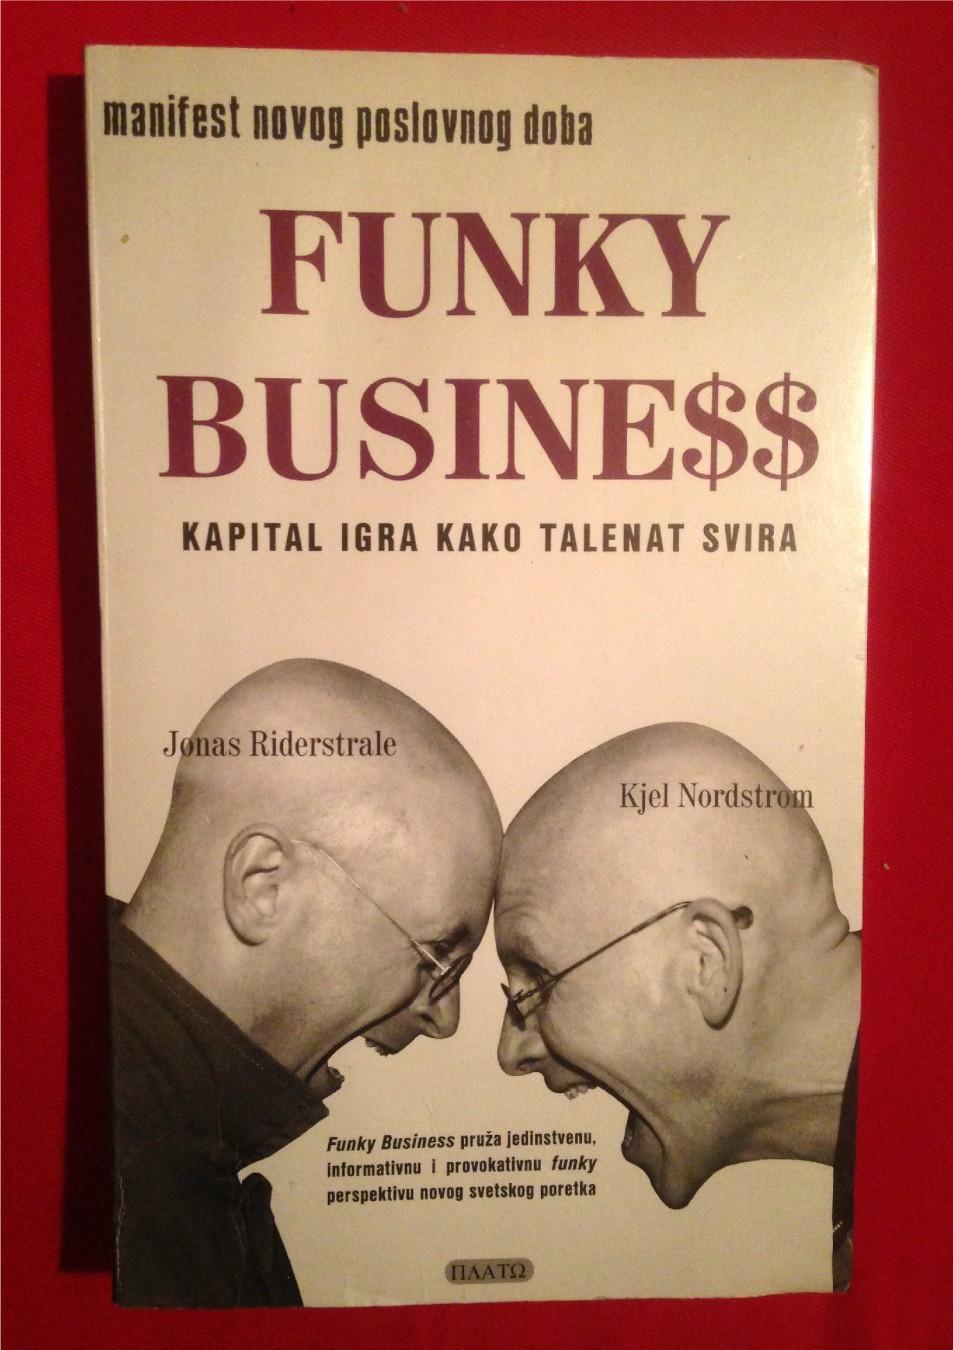 FUNKY BUSINESS KNJIGA EBOOK DOWNLOAD